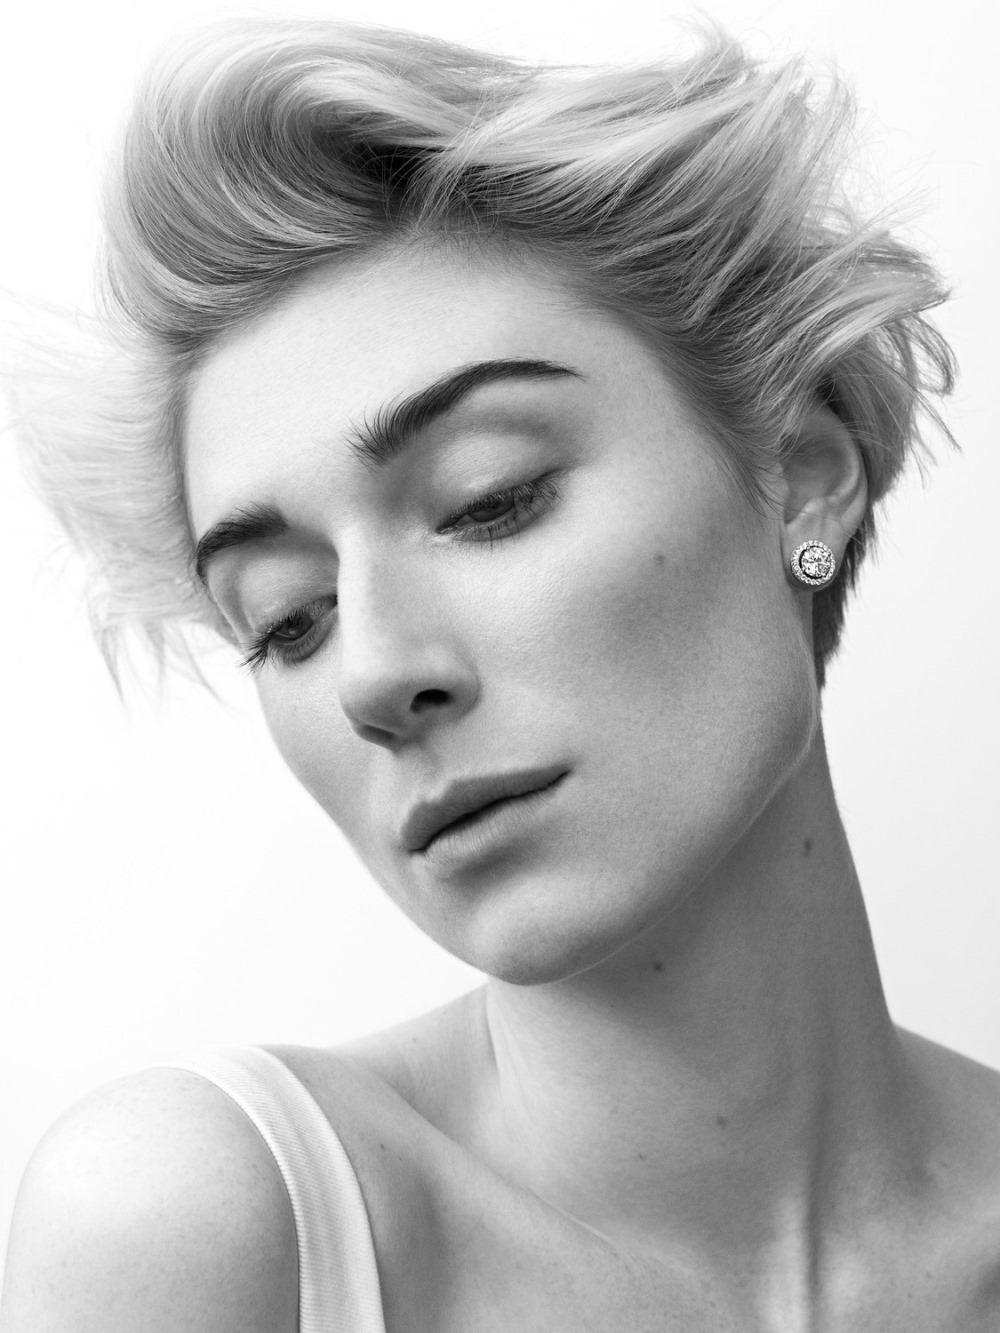 Richa Pallod,Eleanor Powell Sex pic Poppy Drayton (born 1991),Roosmarijn de Kok NED 2017